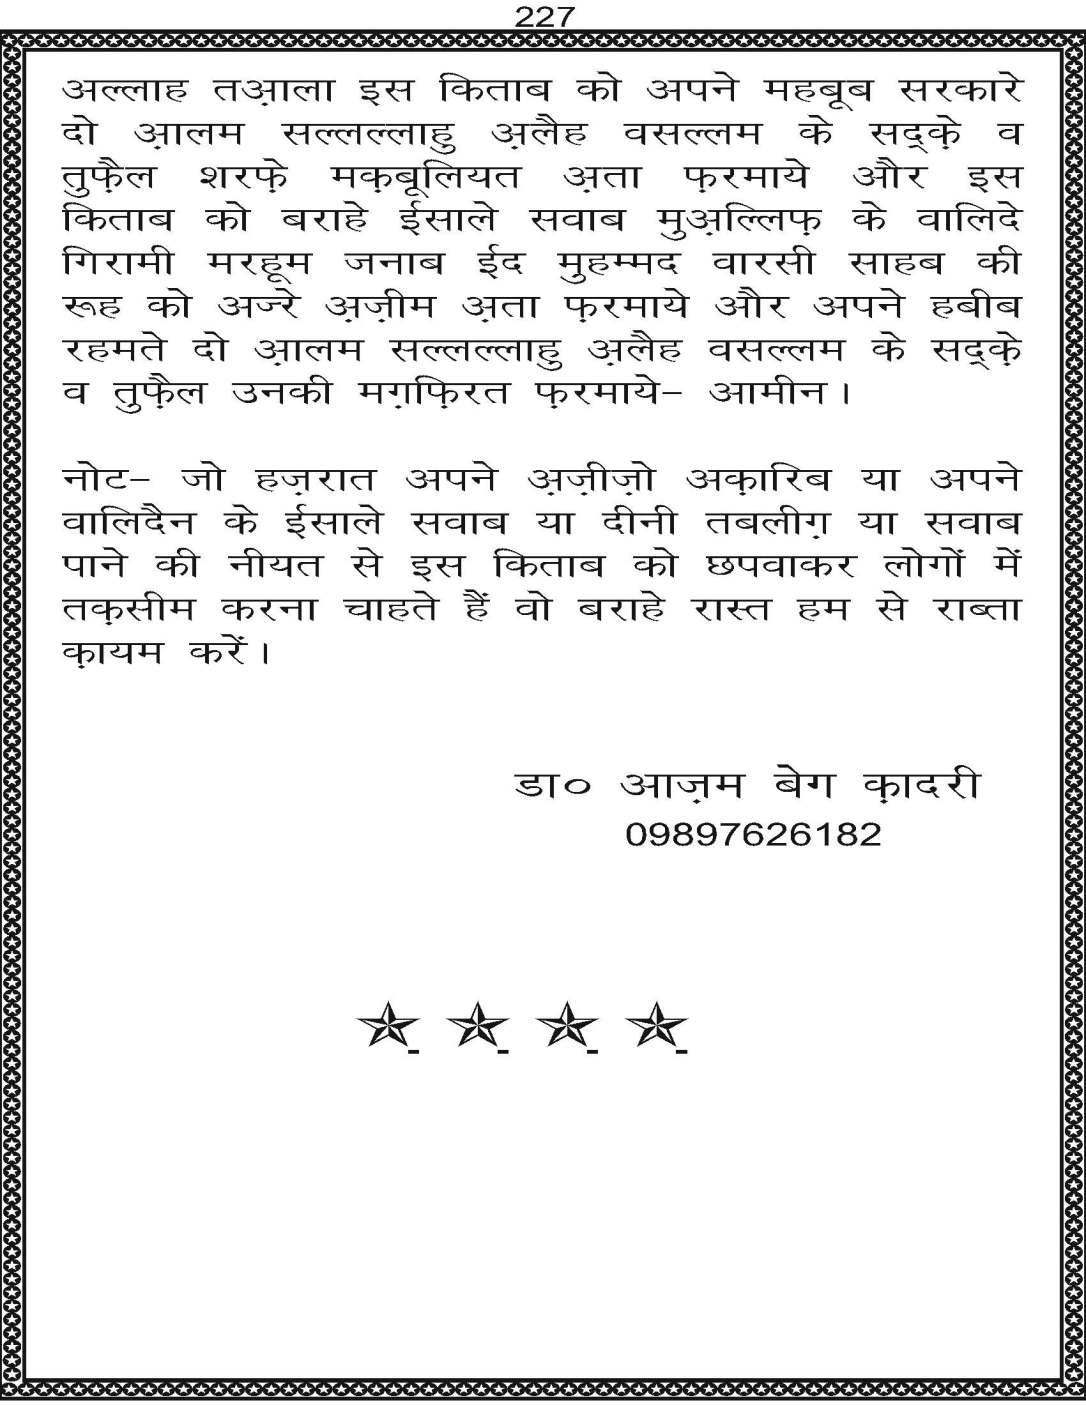 AzmateTaziyadari_Page_227